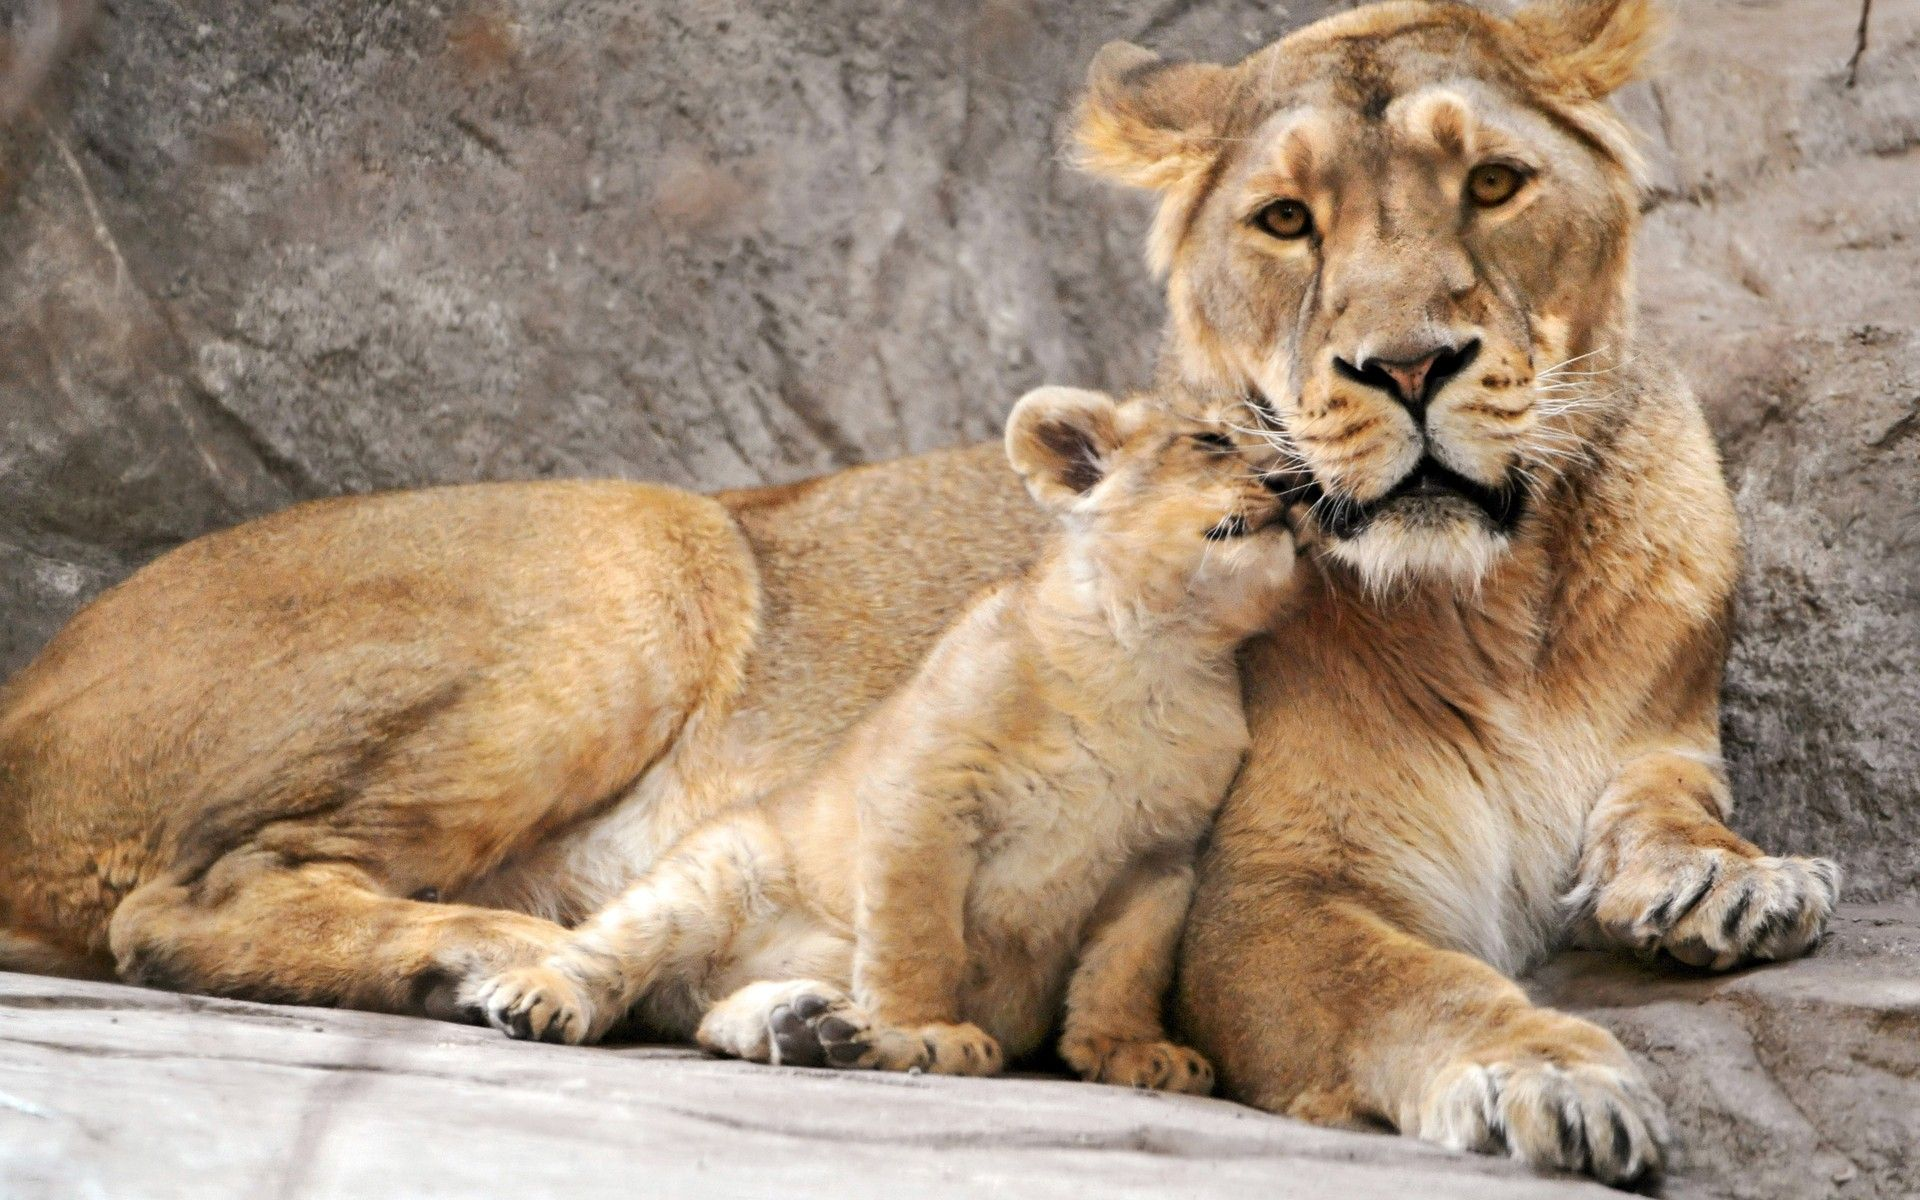 View source image godus amazing animals pinterest